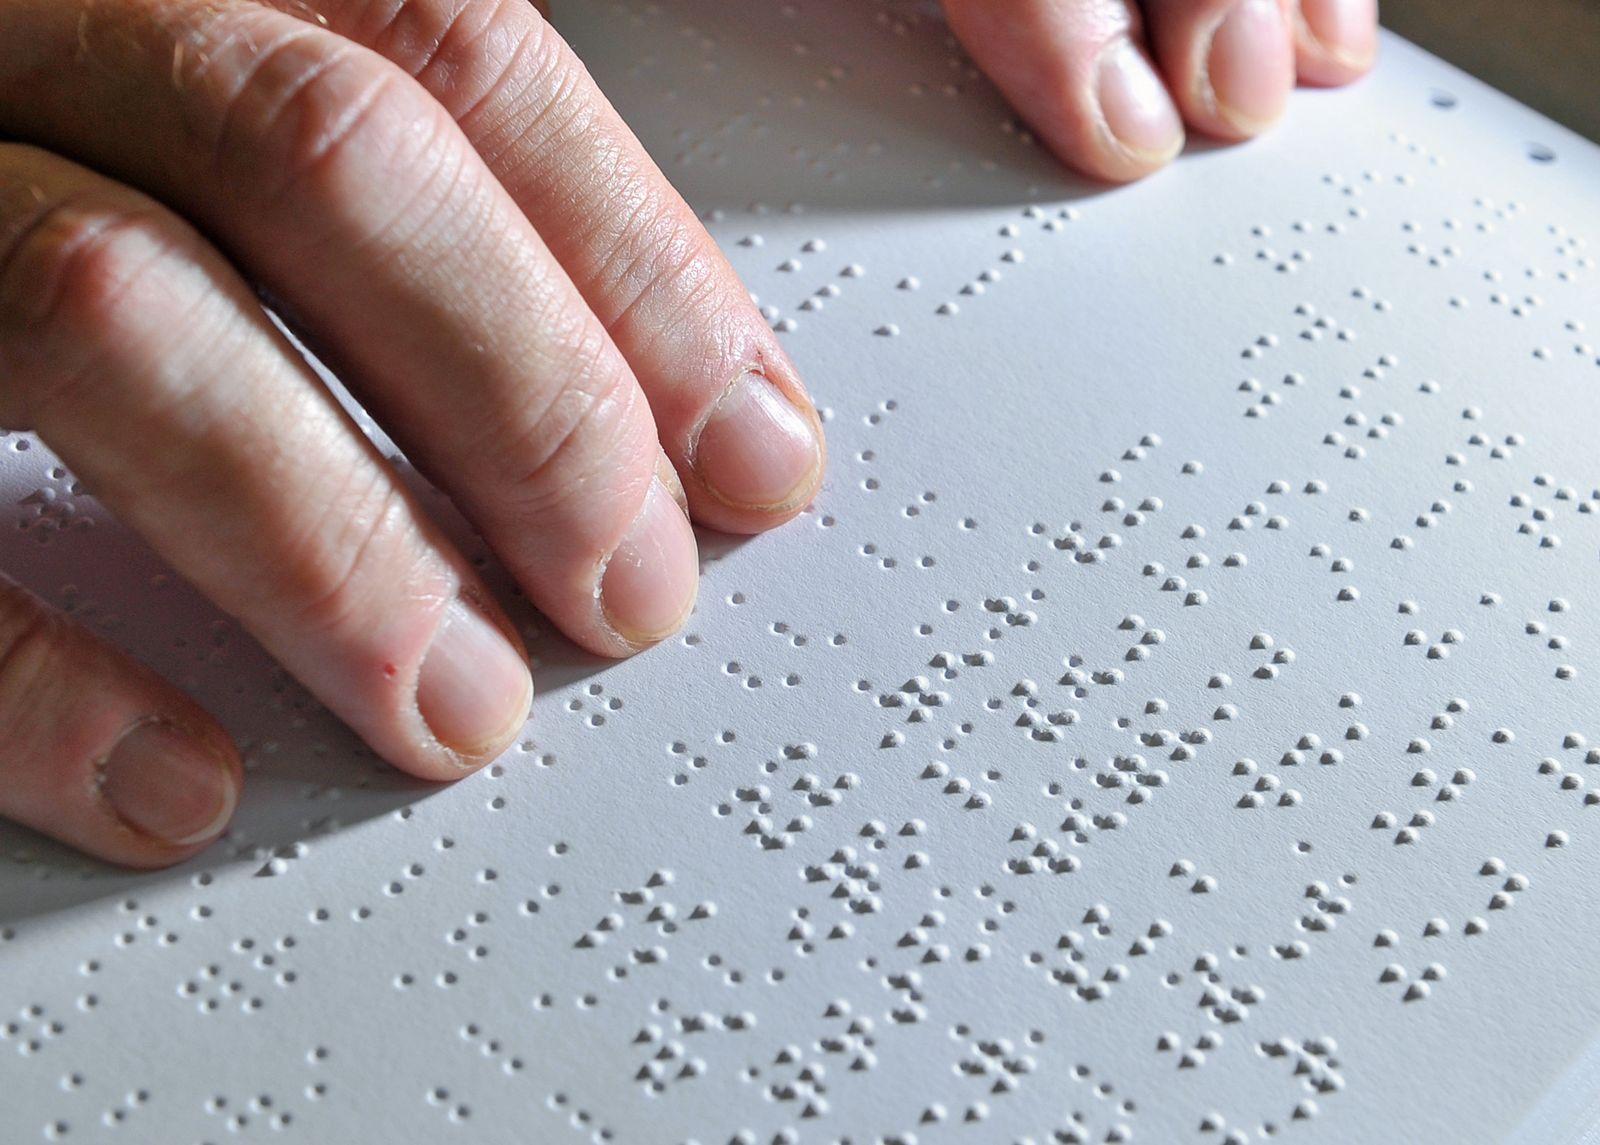 Am 4. Januar - Welt-Braille-Tag